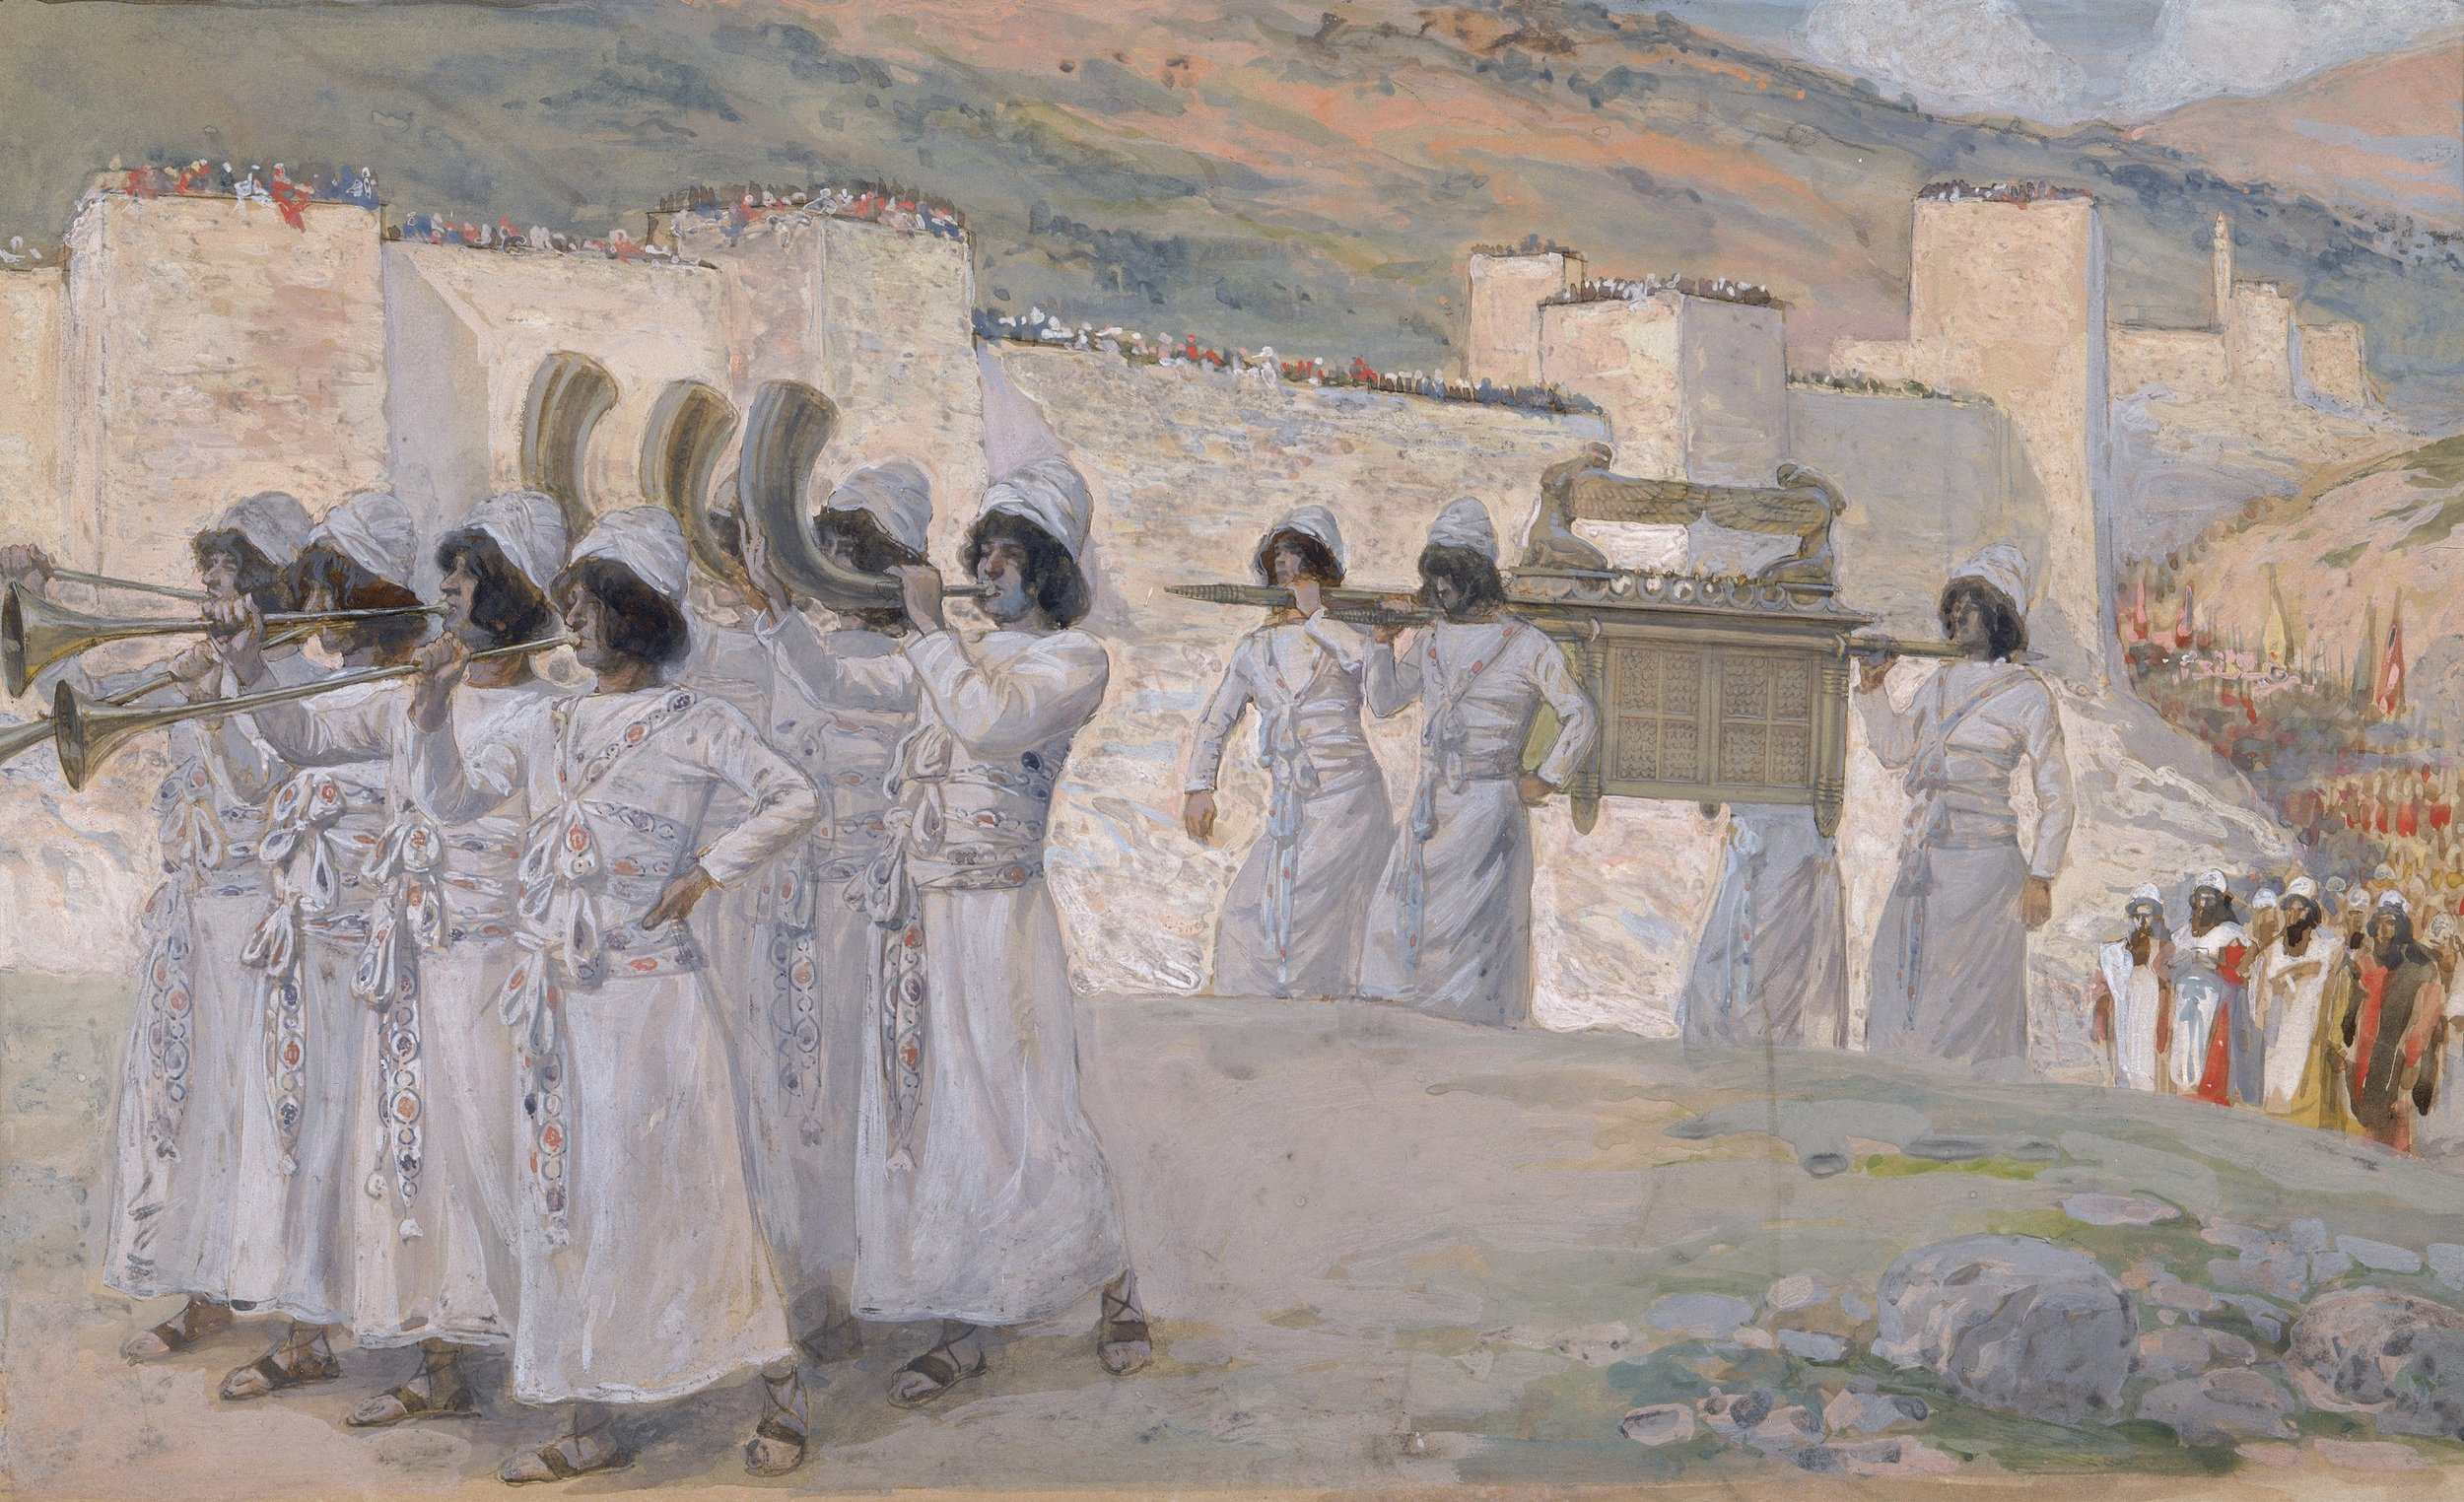 The Seven Trumpets of Jericho by James Jacques Joseph Tissot